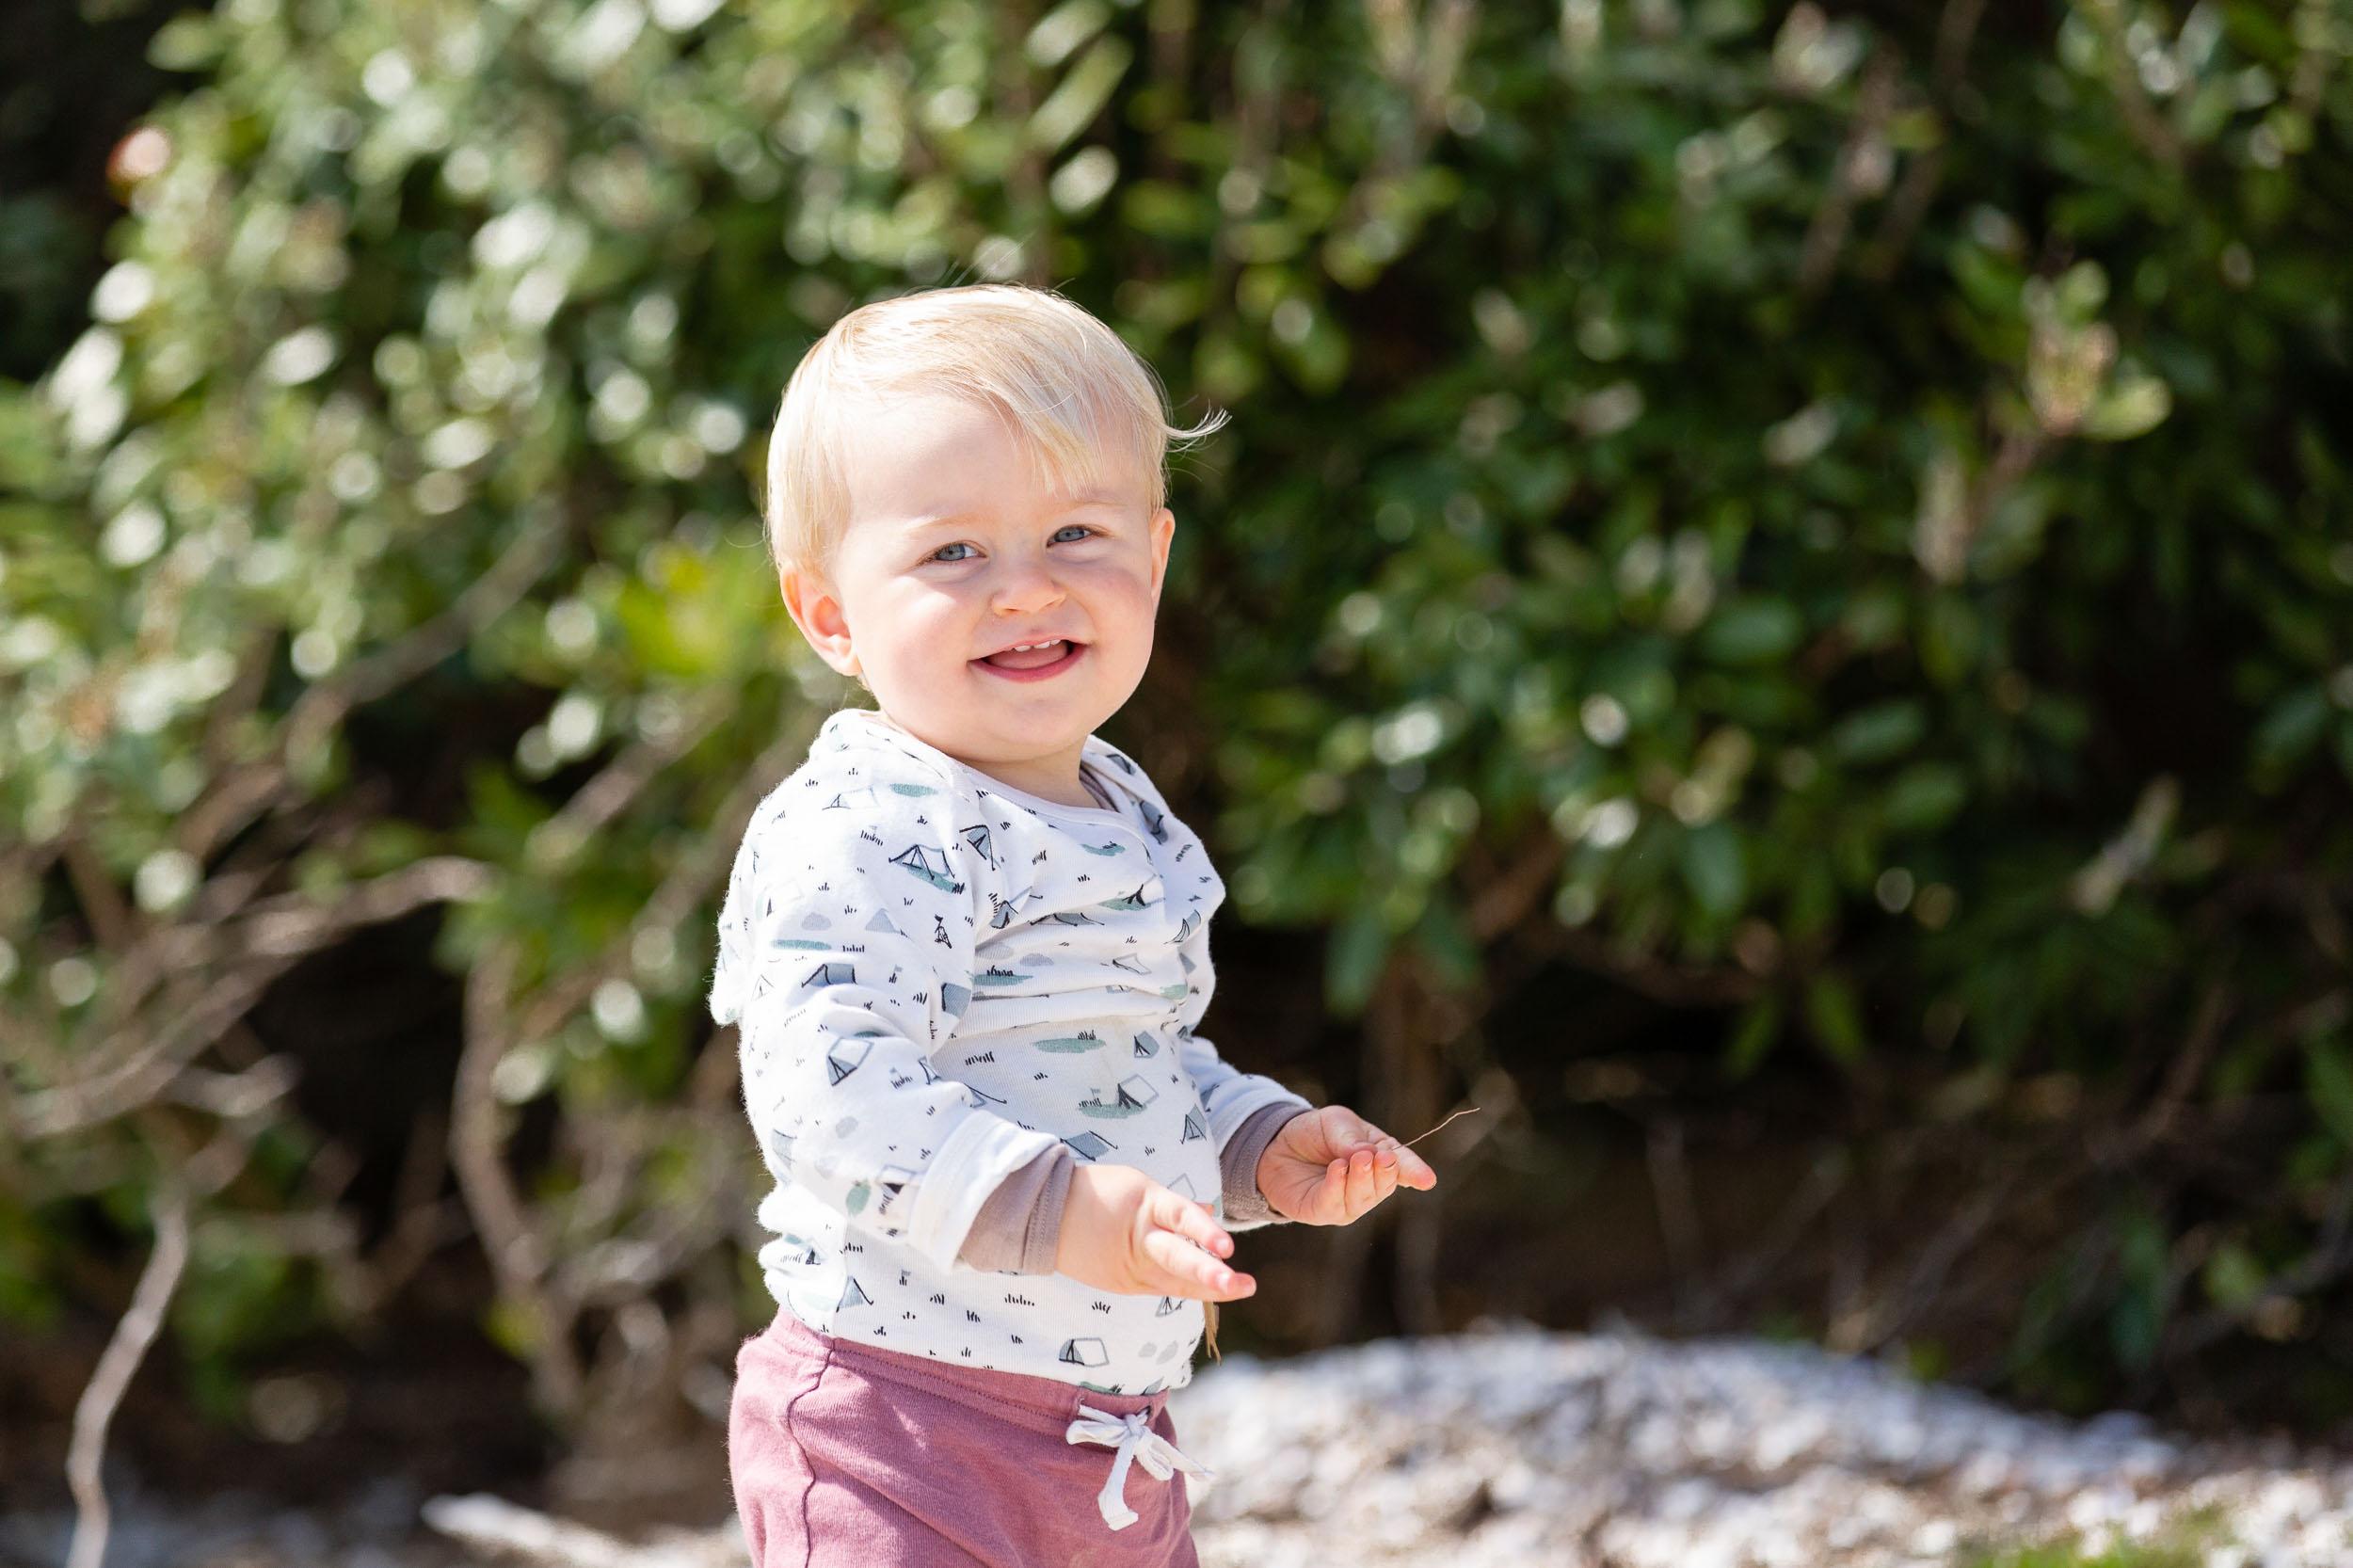 Aucklandfamilyphotographer (14 of 14).jpg